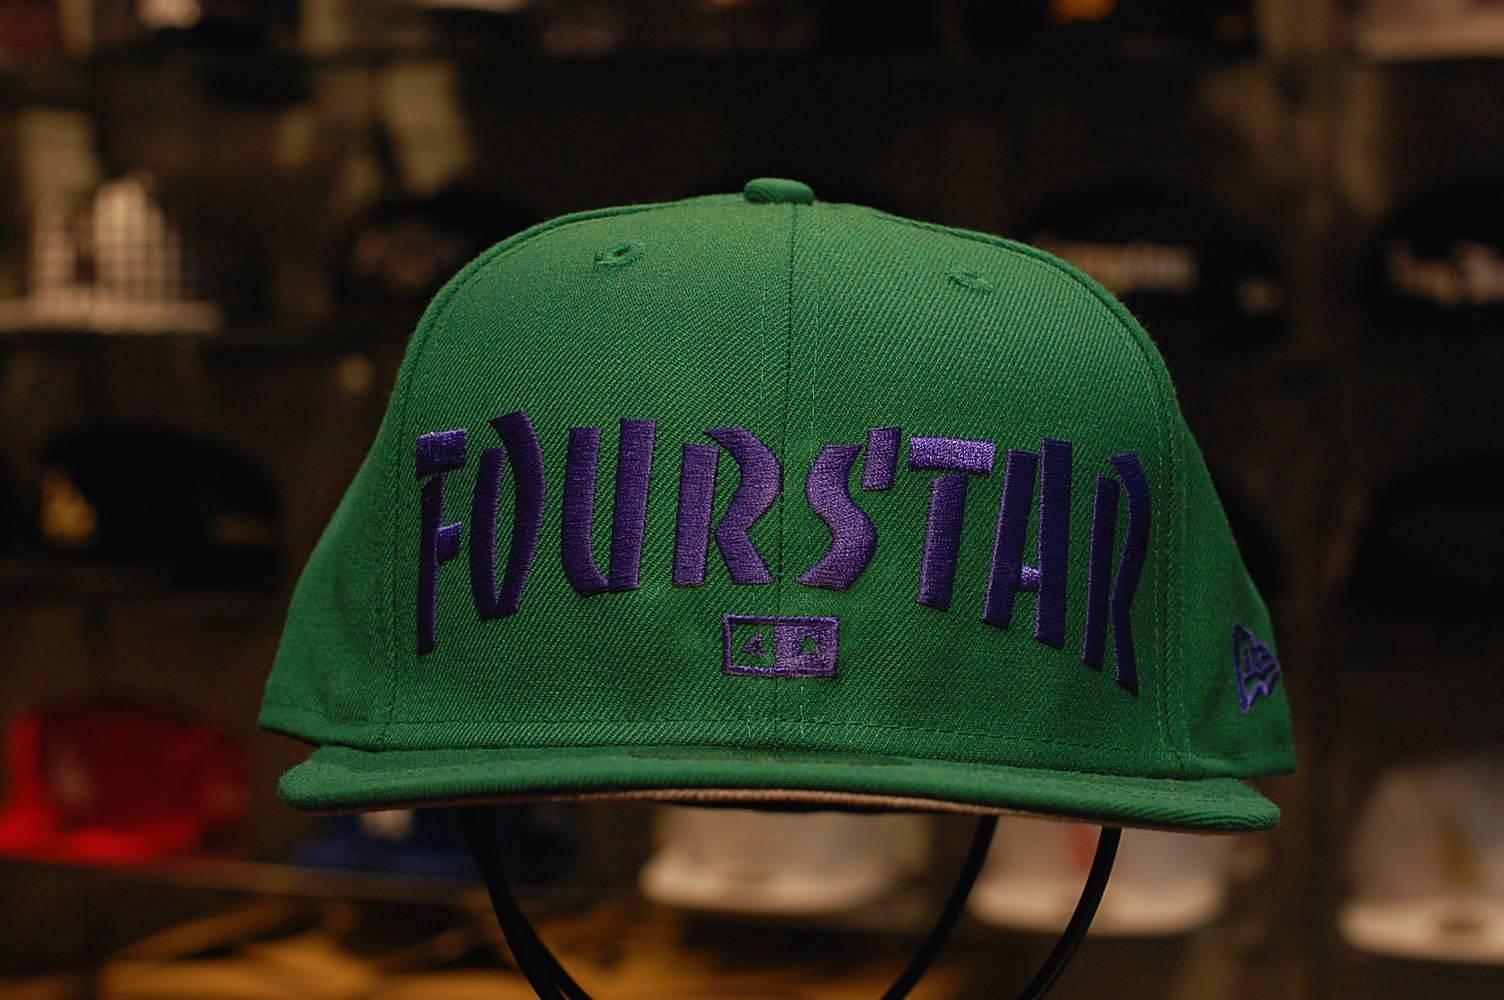 91fbaf34855 GUY MARIANOらが1996年に立ち上げ. MARK GONZALESやMAX SCHAAF等業界では名の知れた人物が提案する. SKATE  BRANDのFOUR STARから. NEW ERA CAPが店頭に到着です